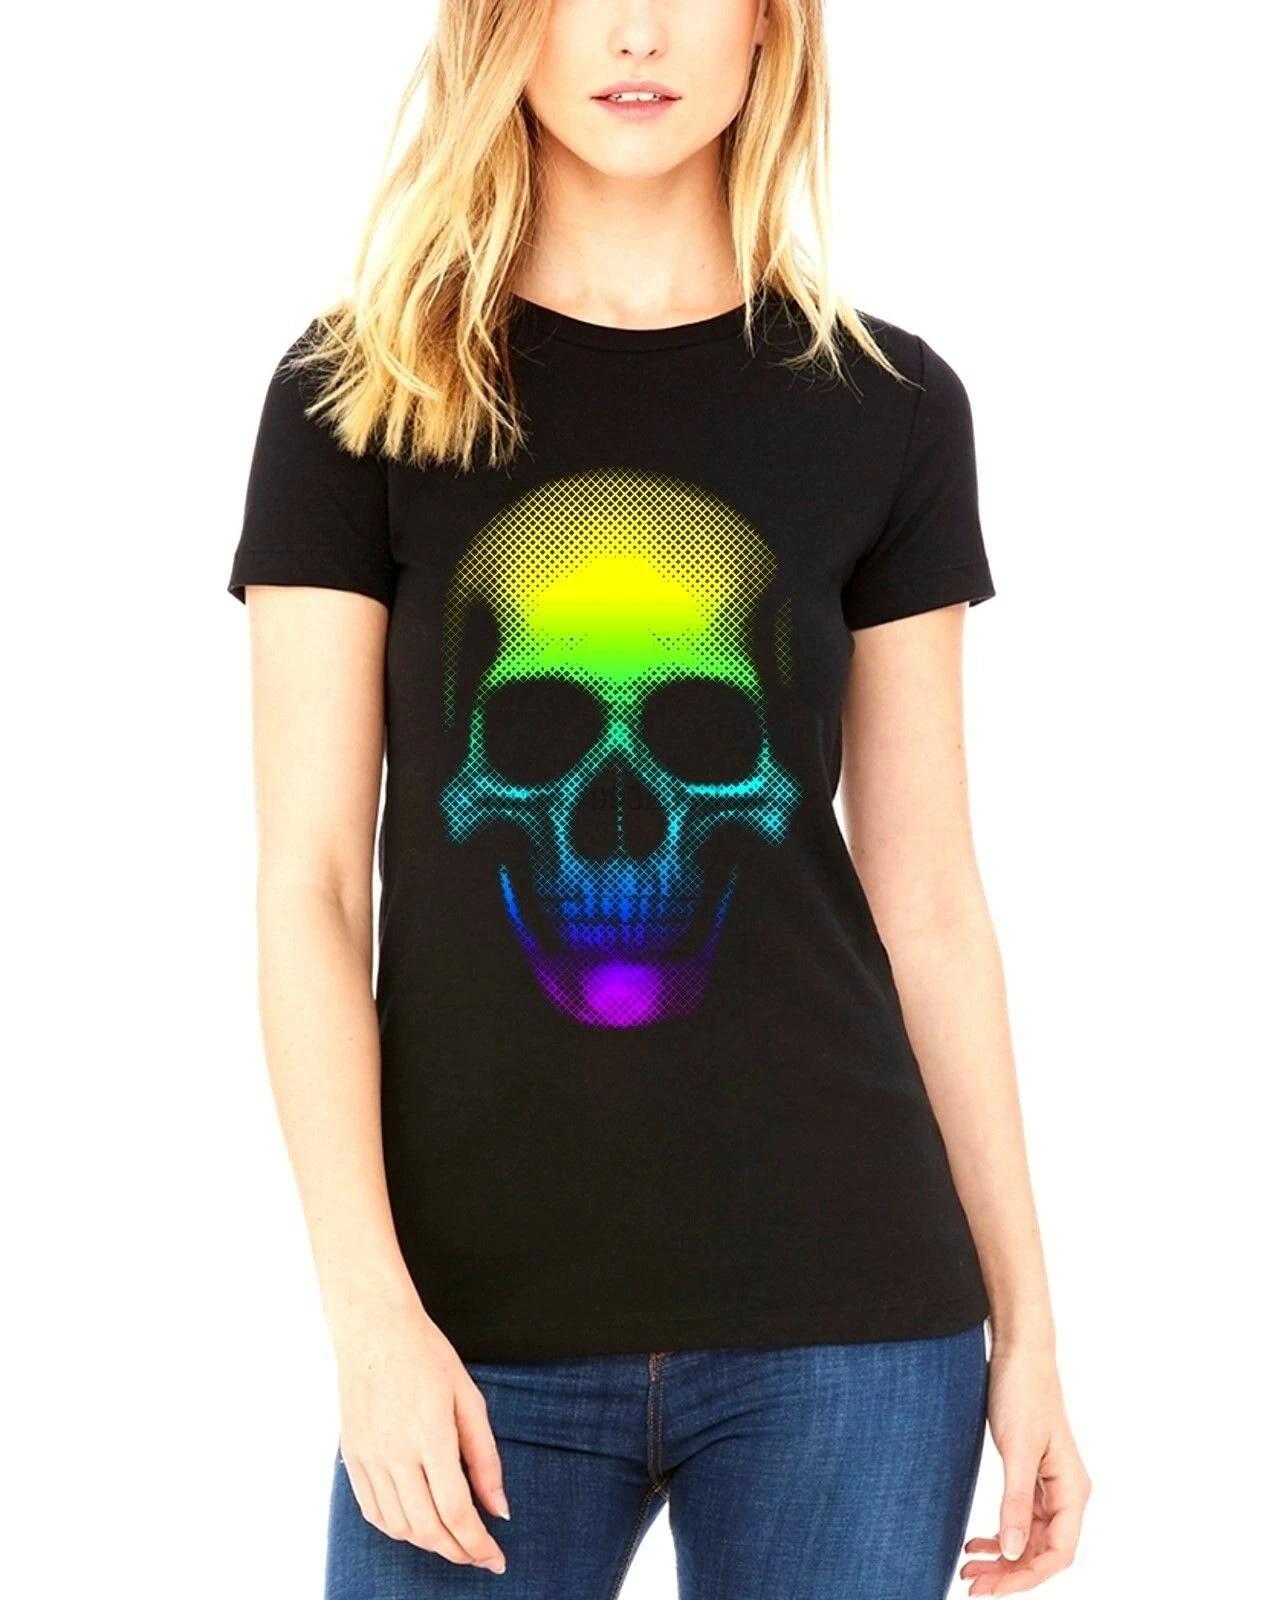 Velocitee Ladies Long Sleeve T-Shirt Colourful Skull Scary Horror Goth V130